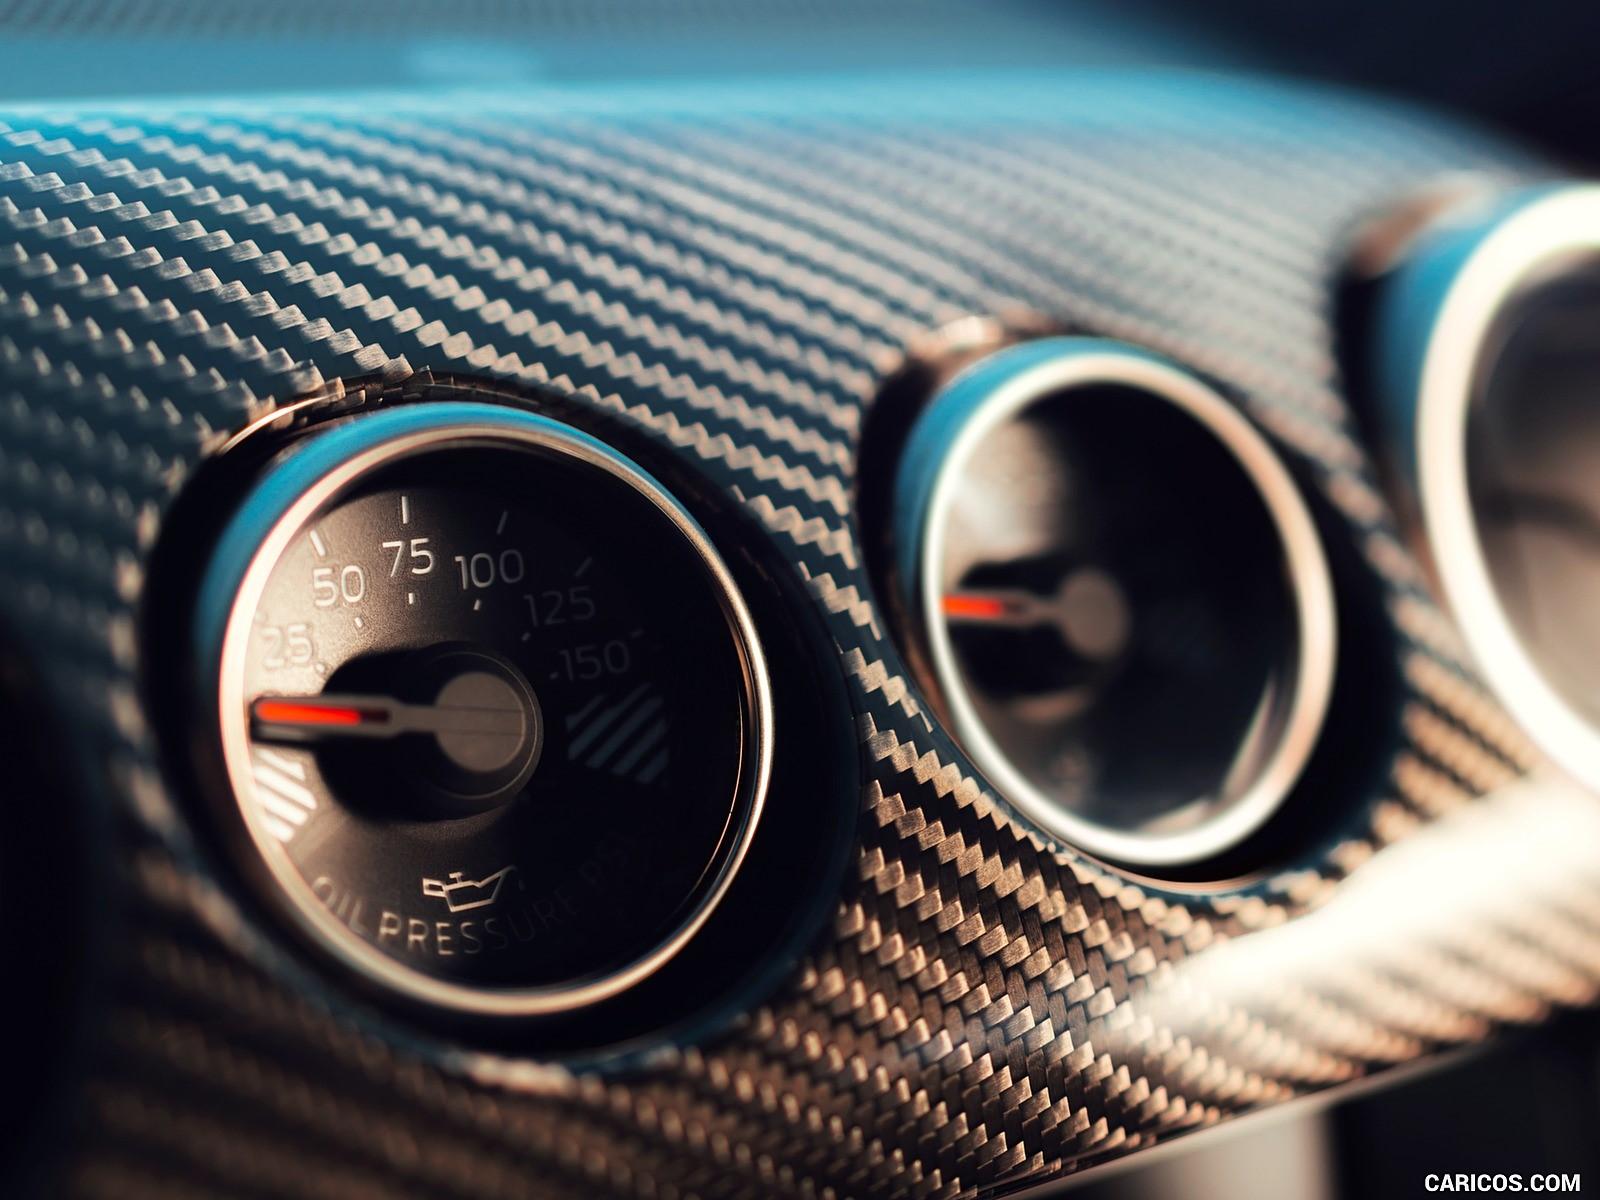 Ford Mustang Shelby uhd resimleri